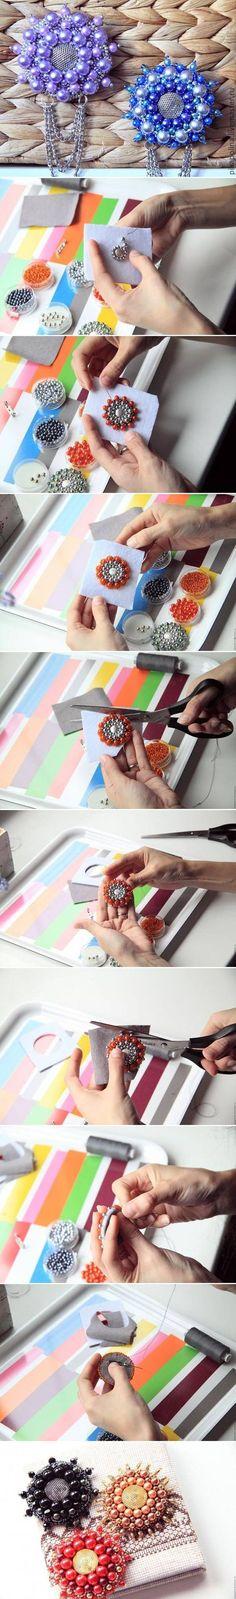 DIY Beads Flower Brooch